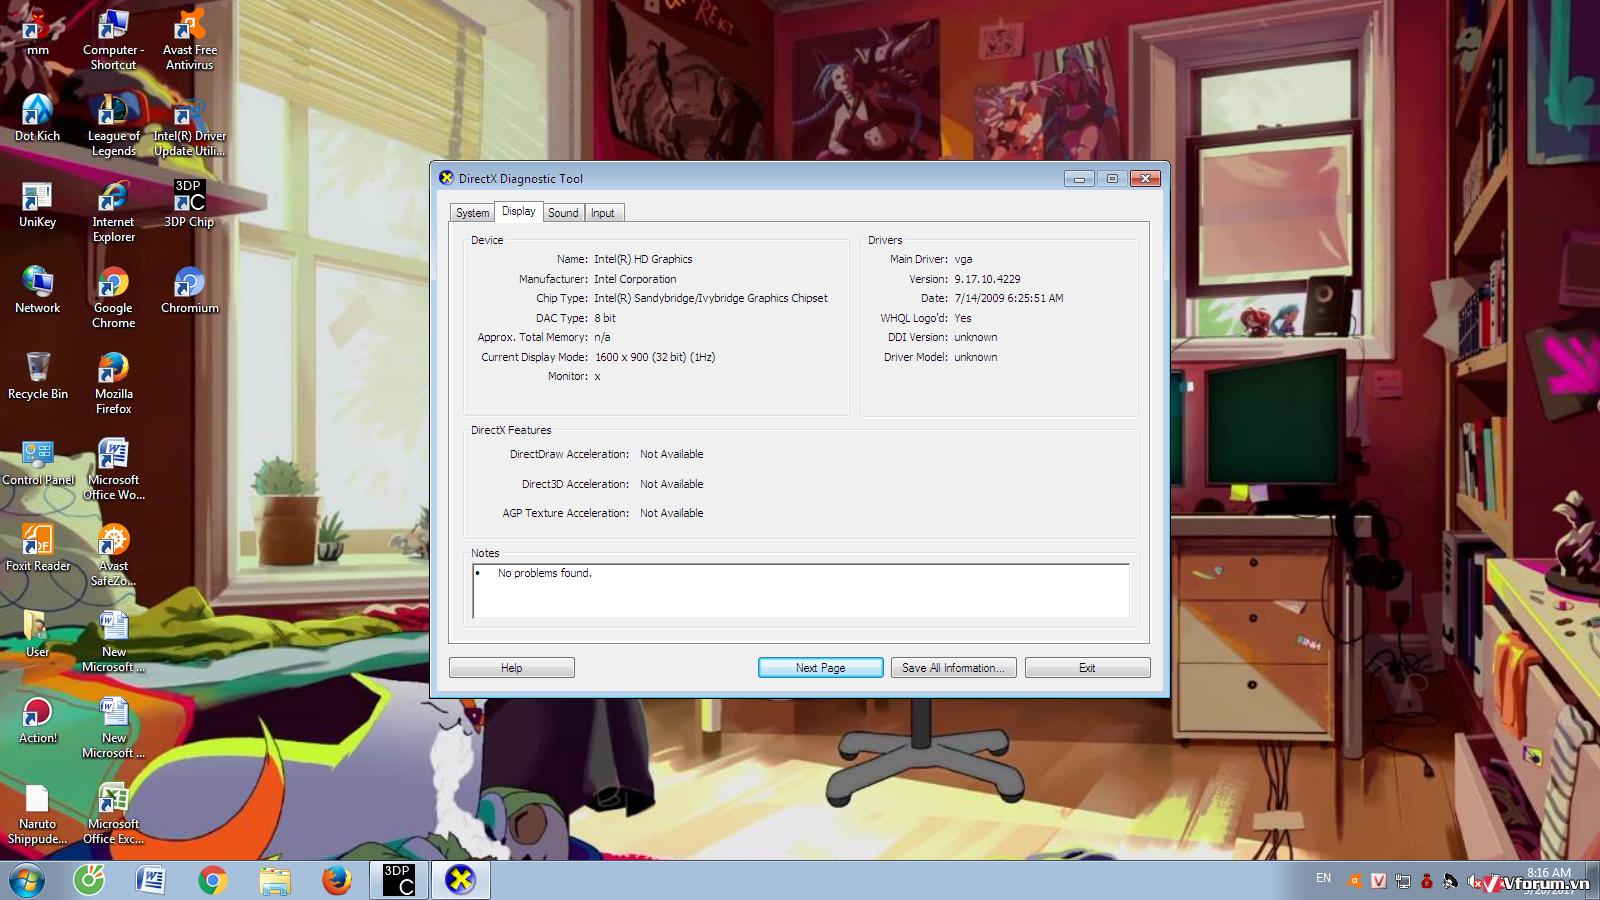 Dell inspiron n5110 wifi drivers win7 32 bit free download